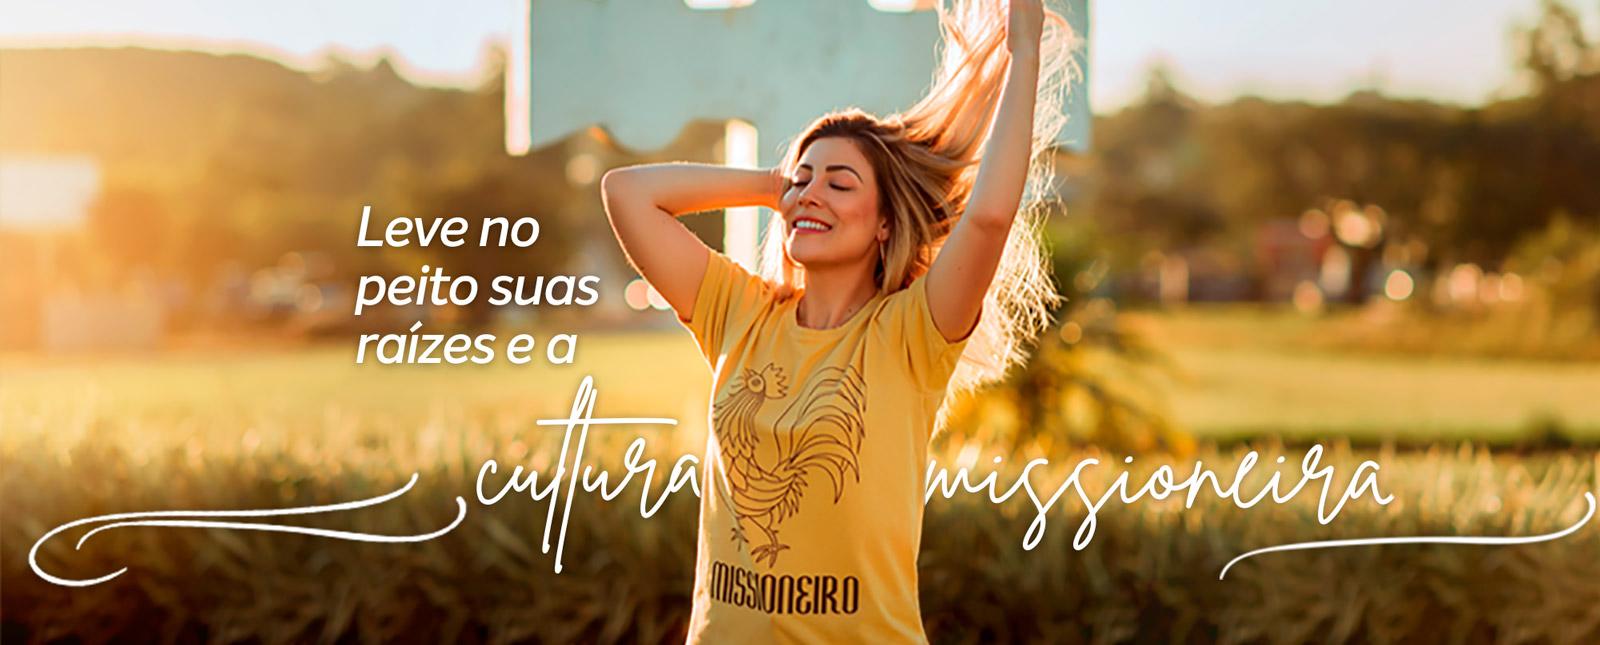 marianita-ortaca-marca-mo-leve-no-peito-suas-raizes-cultura-missioneira